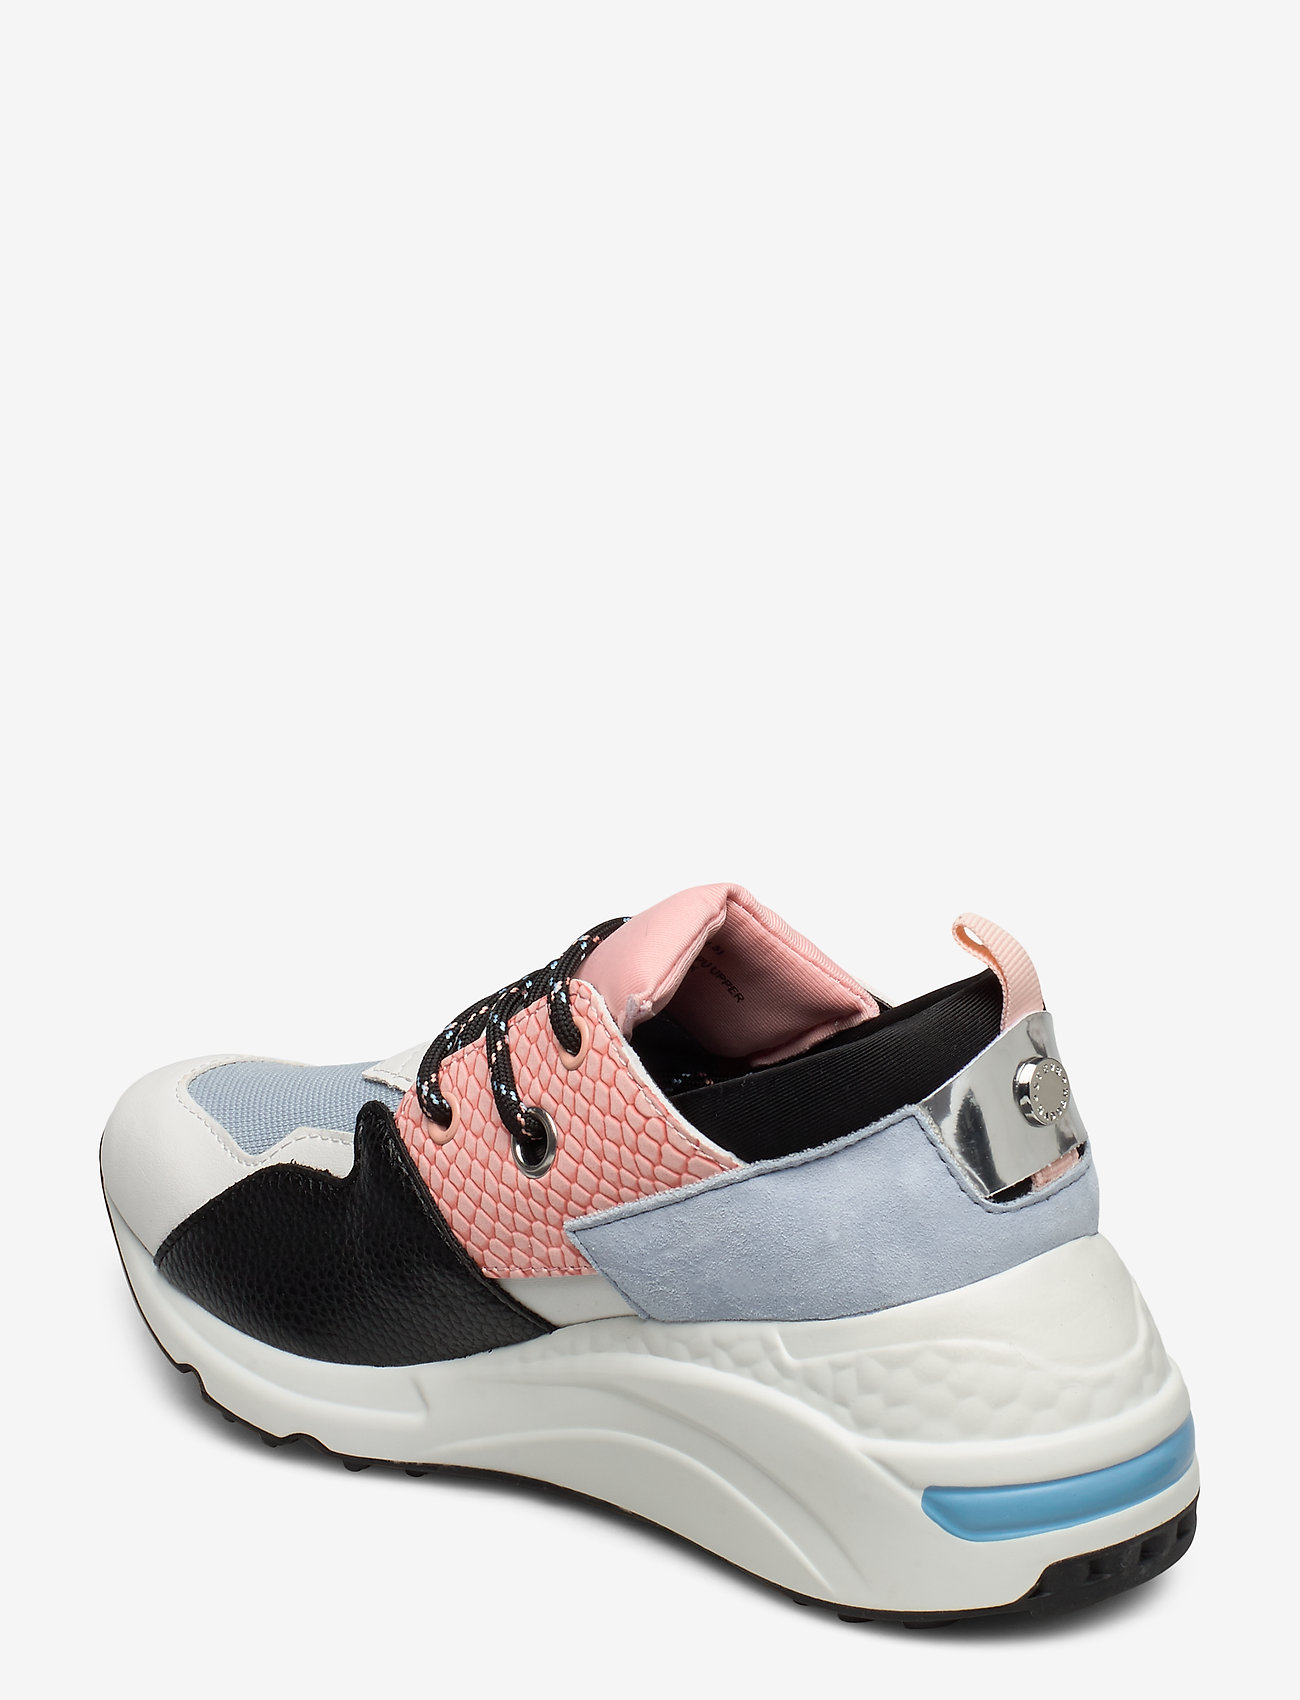 Cliff Sneaker (Blue/pink) - Steve Madden